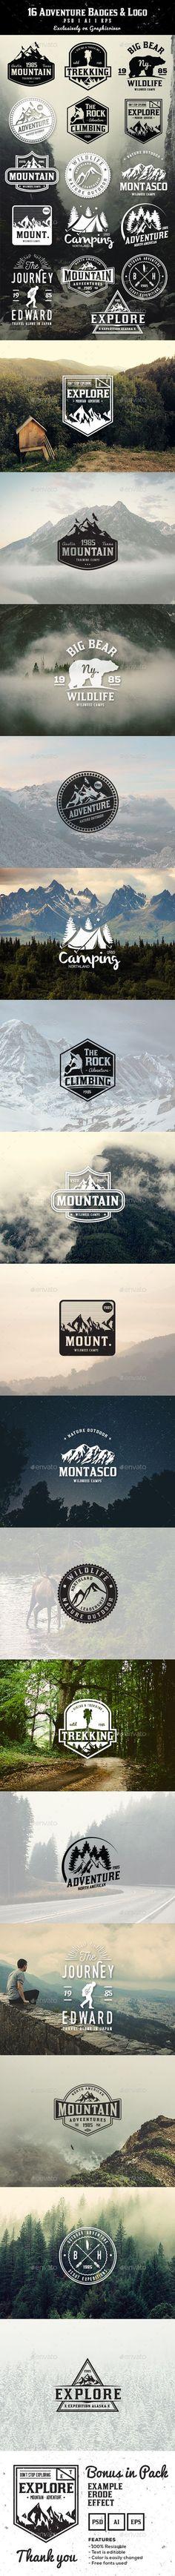 16 Adventure Badges & Logo Template #design Download: http://graphicriver.net/item/16-adventure-badges-logo/11973456?ref=ksioks